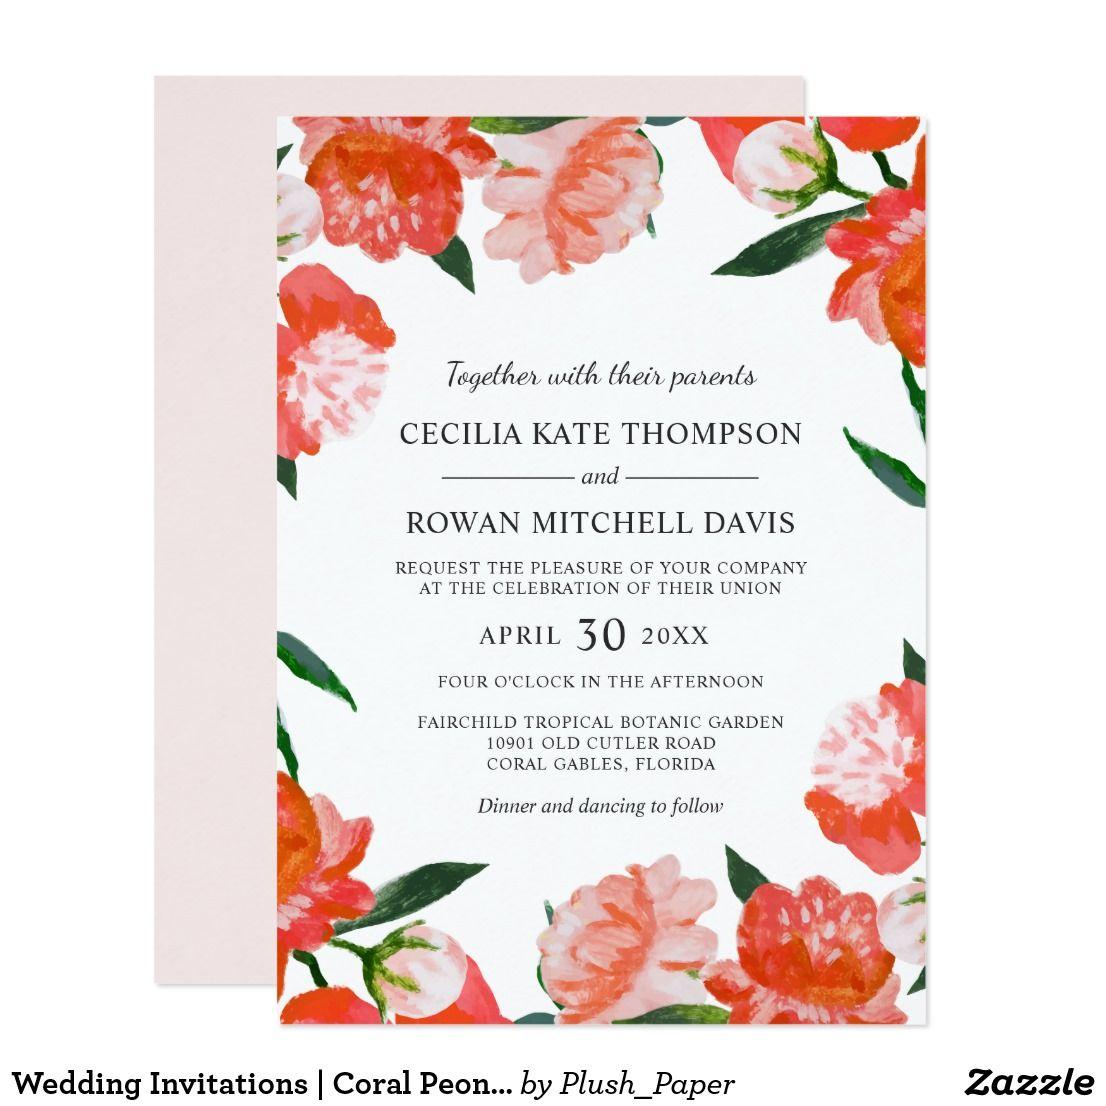 Wedding Invitations | Coral Peony Flowers | Zazzle.com